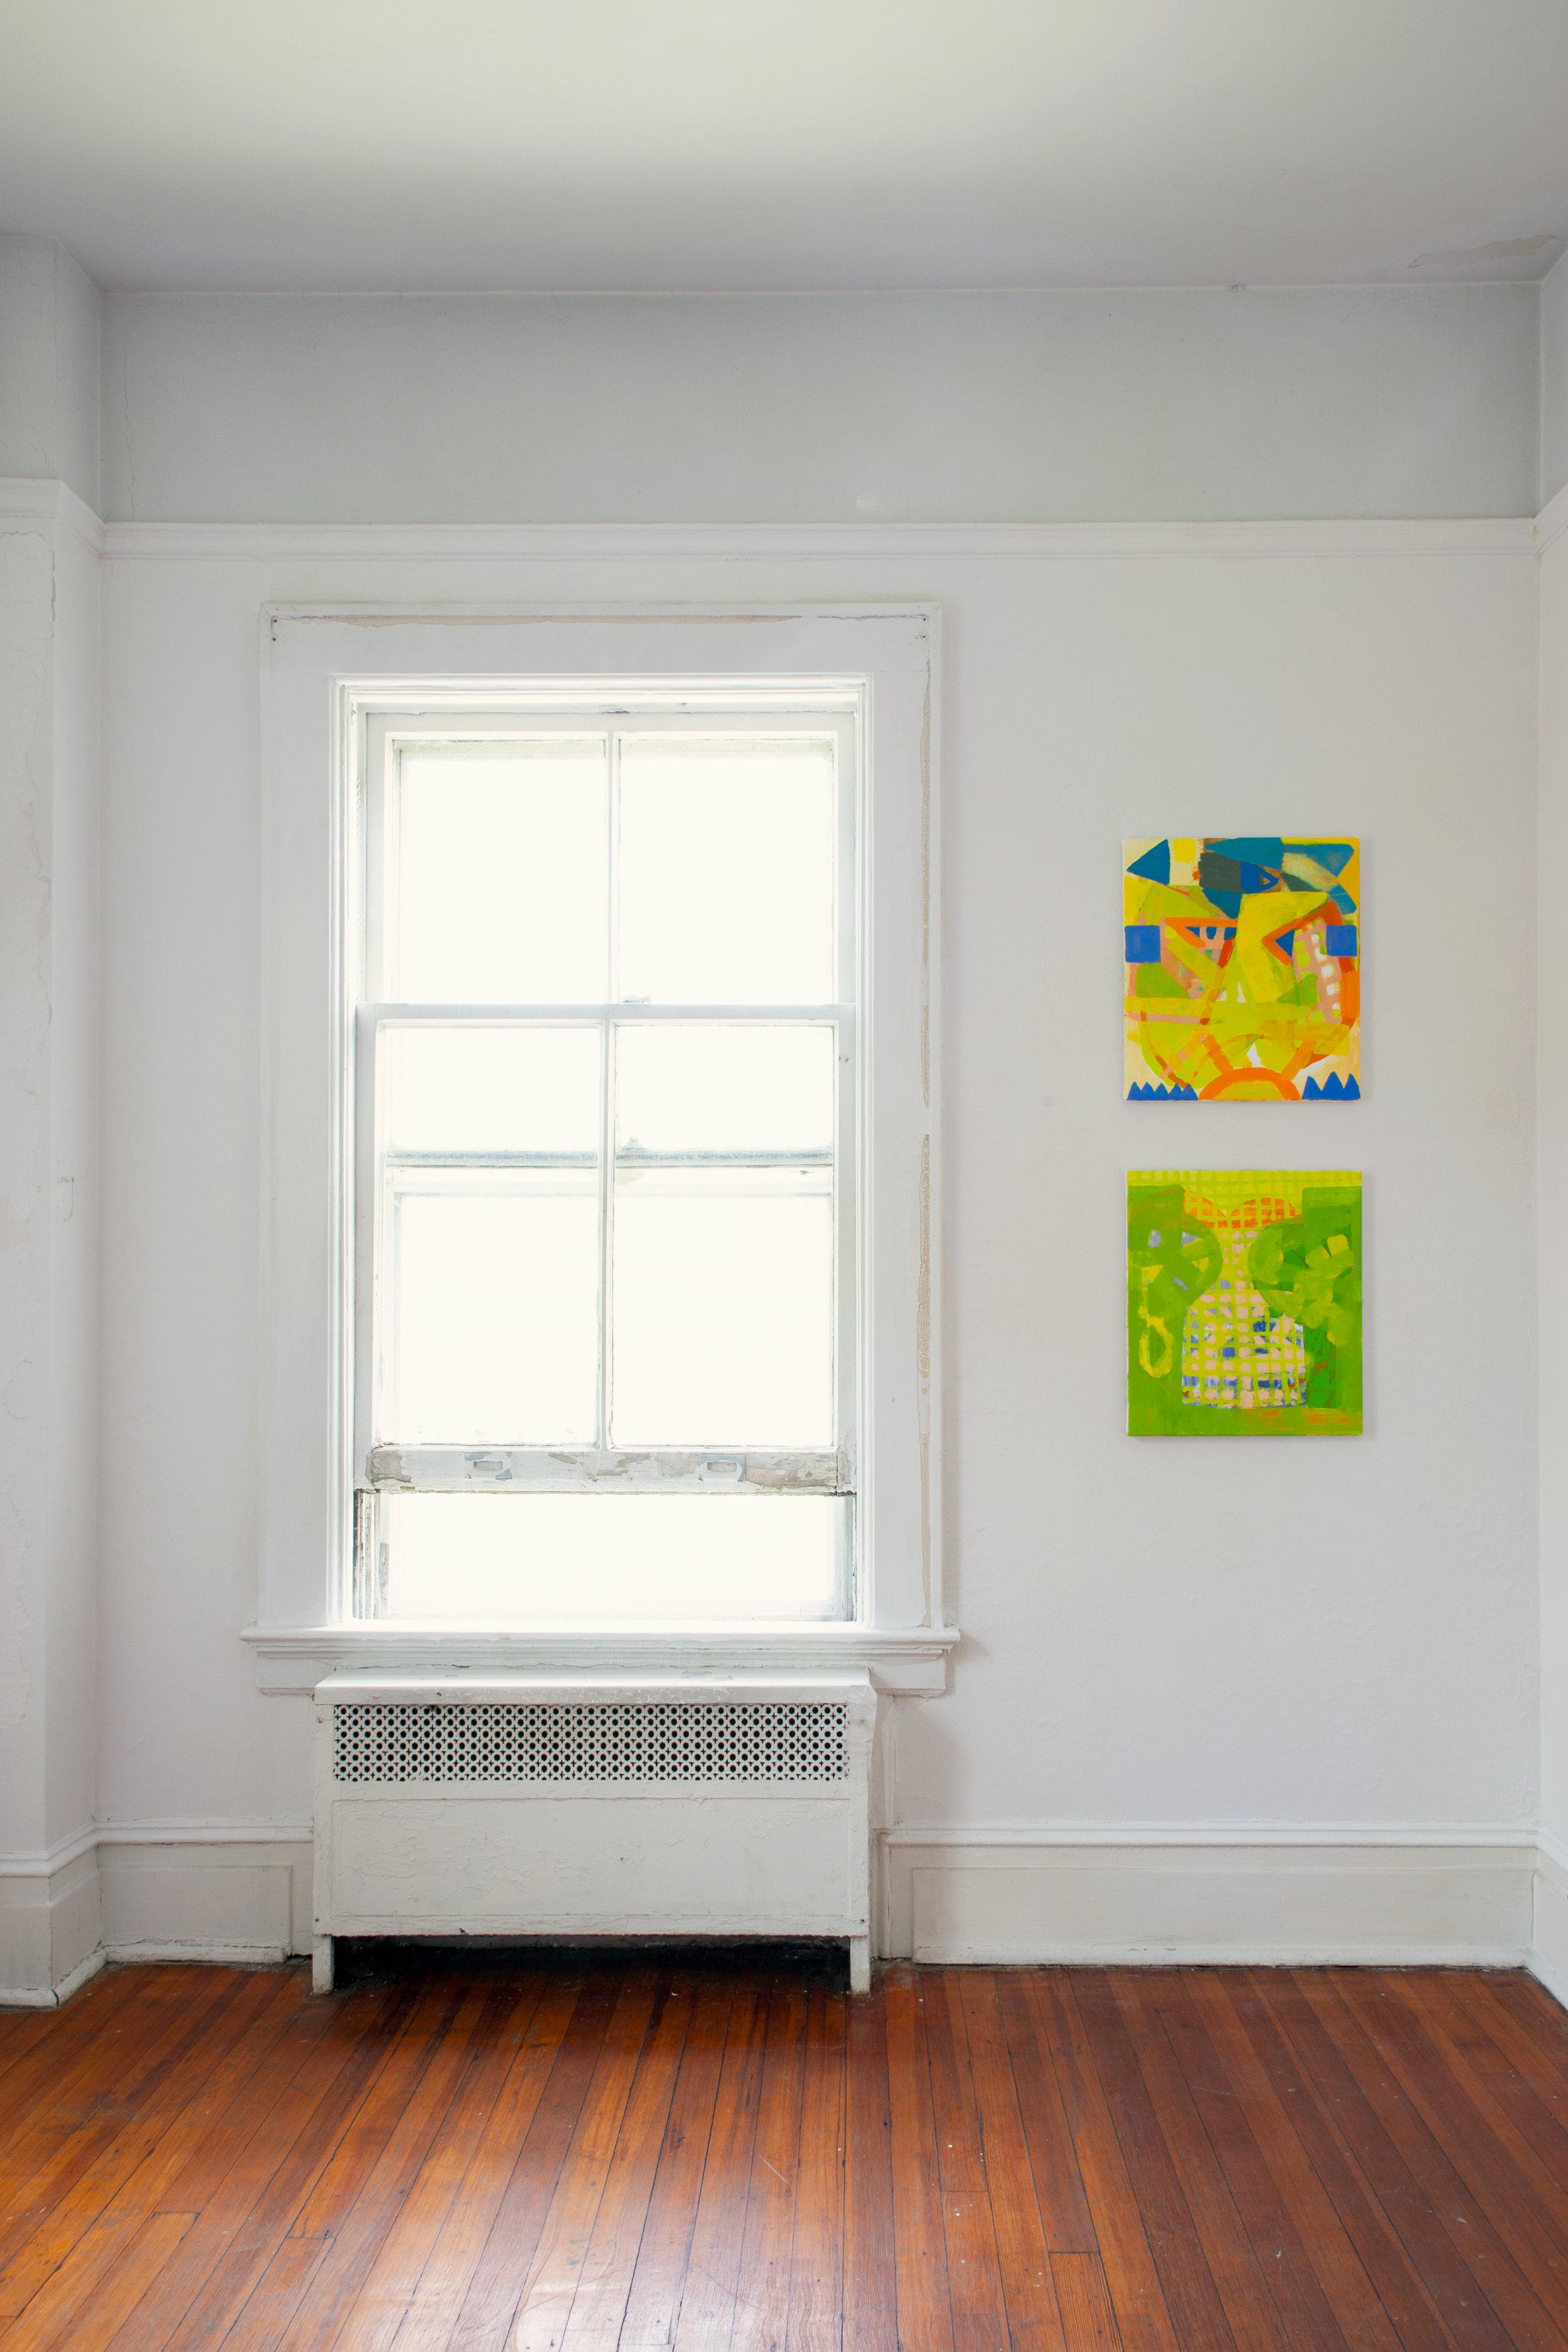 Meghan_Brady-NADA_House-2019-installation_view_07.jpg